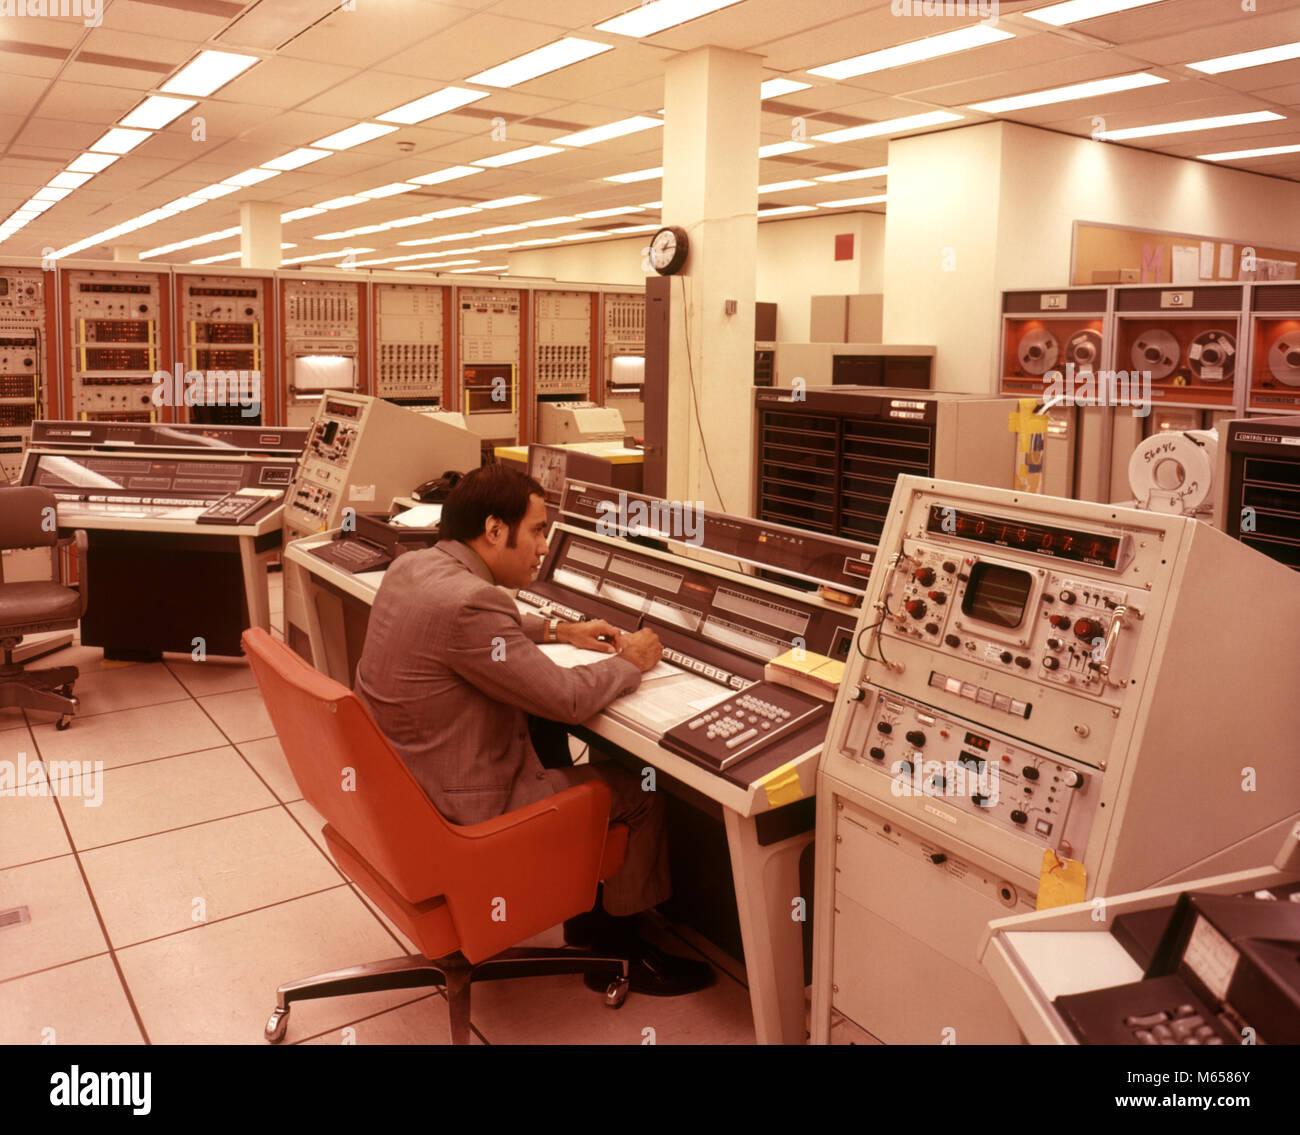 1970 LATINO MAN DE CONTRÔLE DE L'ORDINATEUR DE L'EXPLORATION SPATIALE DE LA NASA ORDINATEURS TEXAS Photo Stock